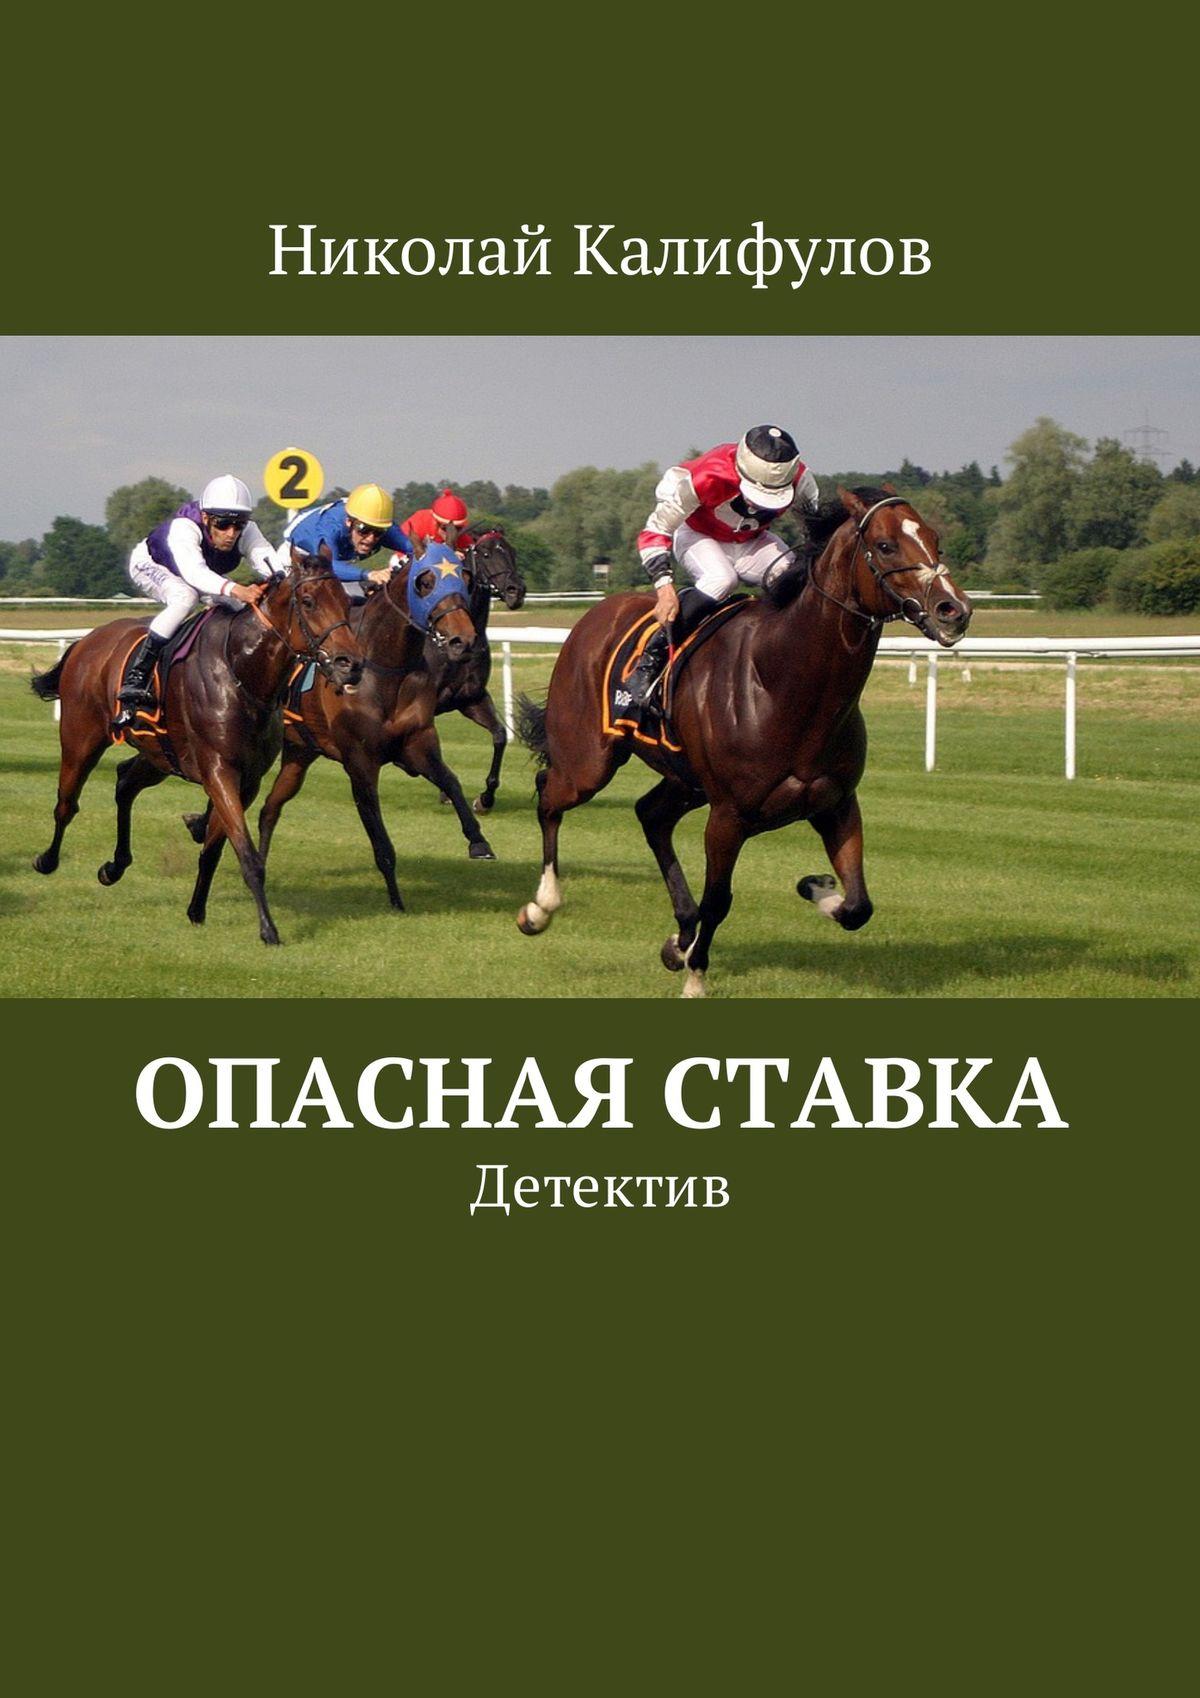 Николай Михайлович Калифулов Опасная ставка. Детектив